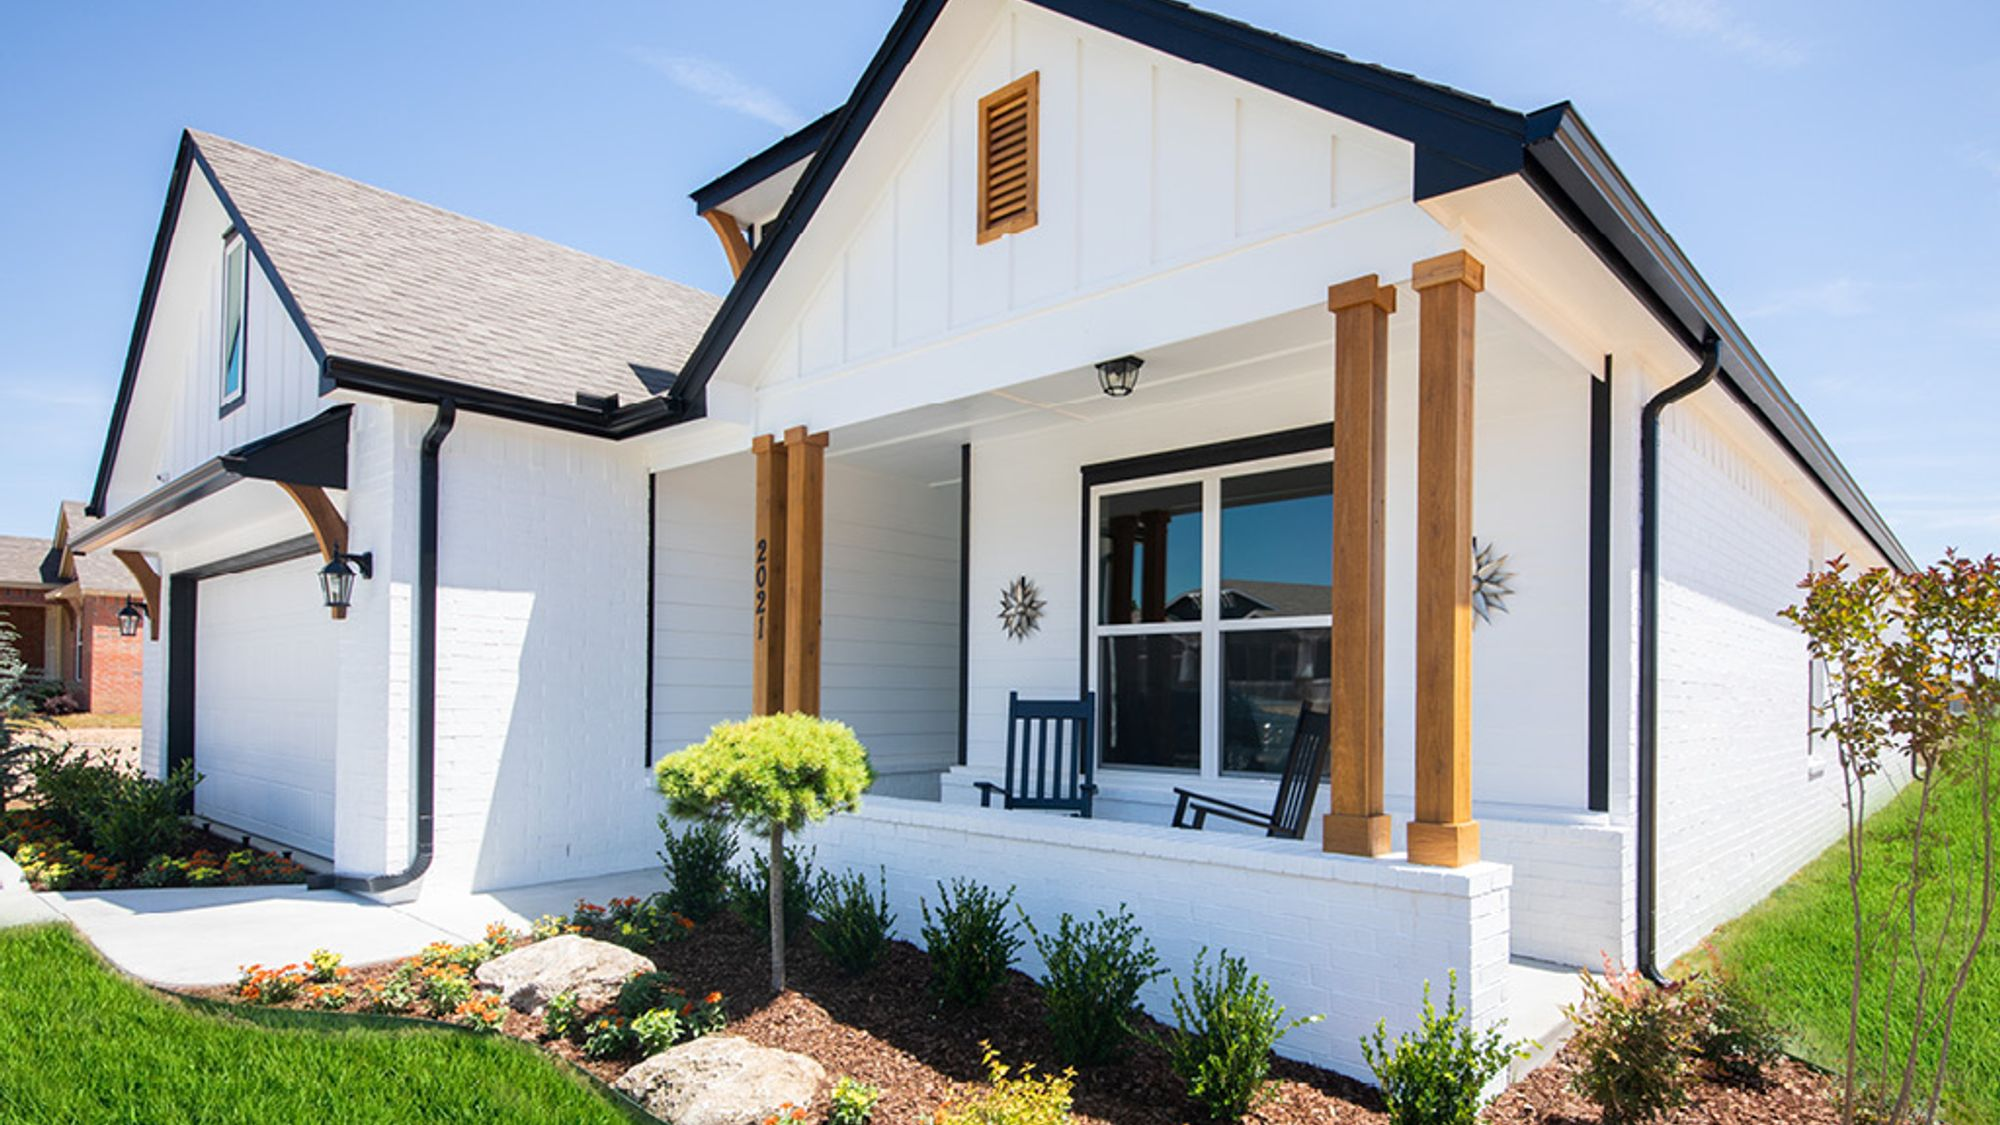 Aspen Crossing model home